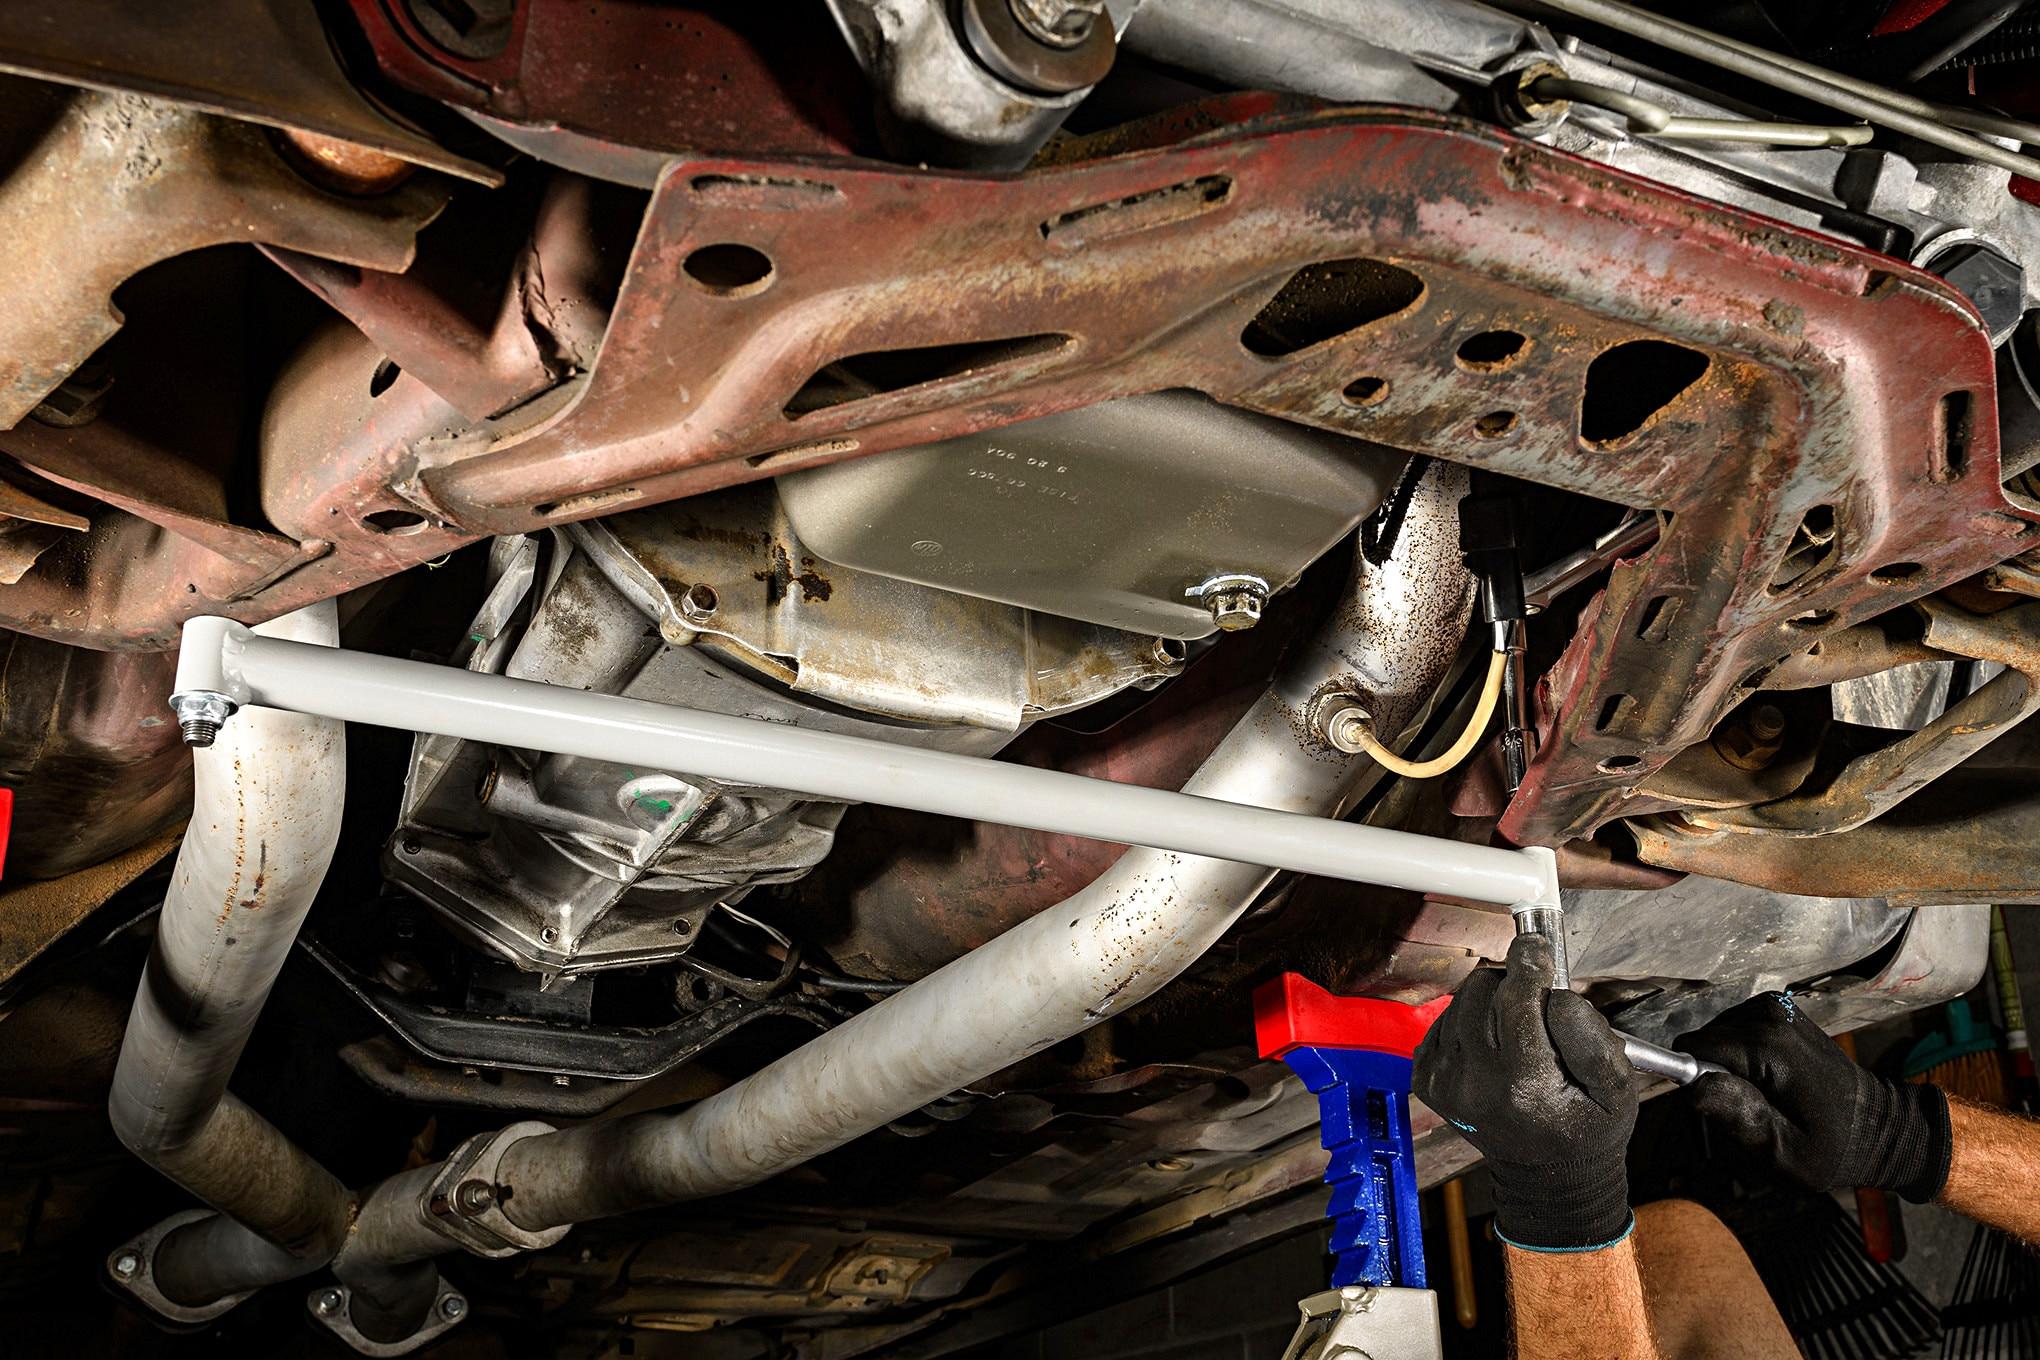 027 Mustang Steeda Suspension Gtrac Brace Installation